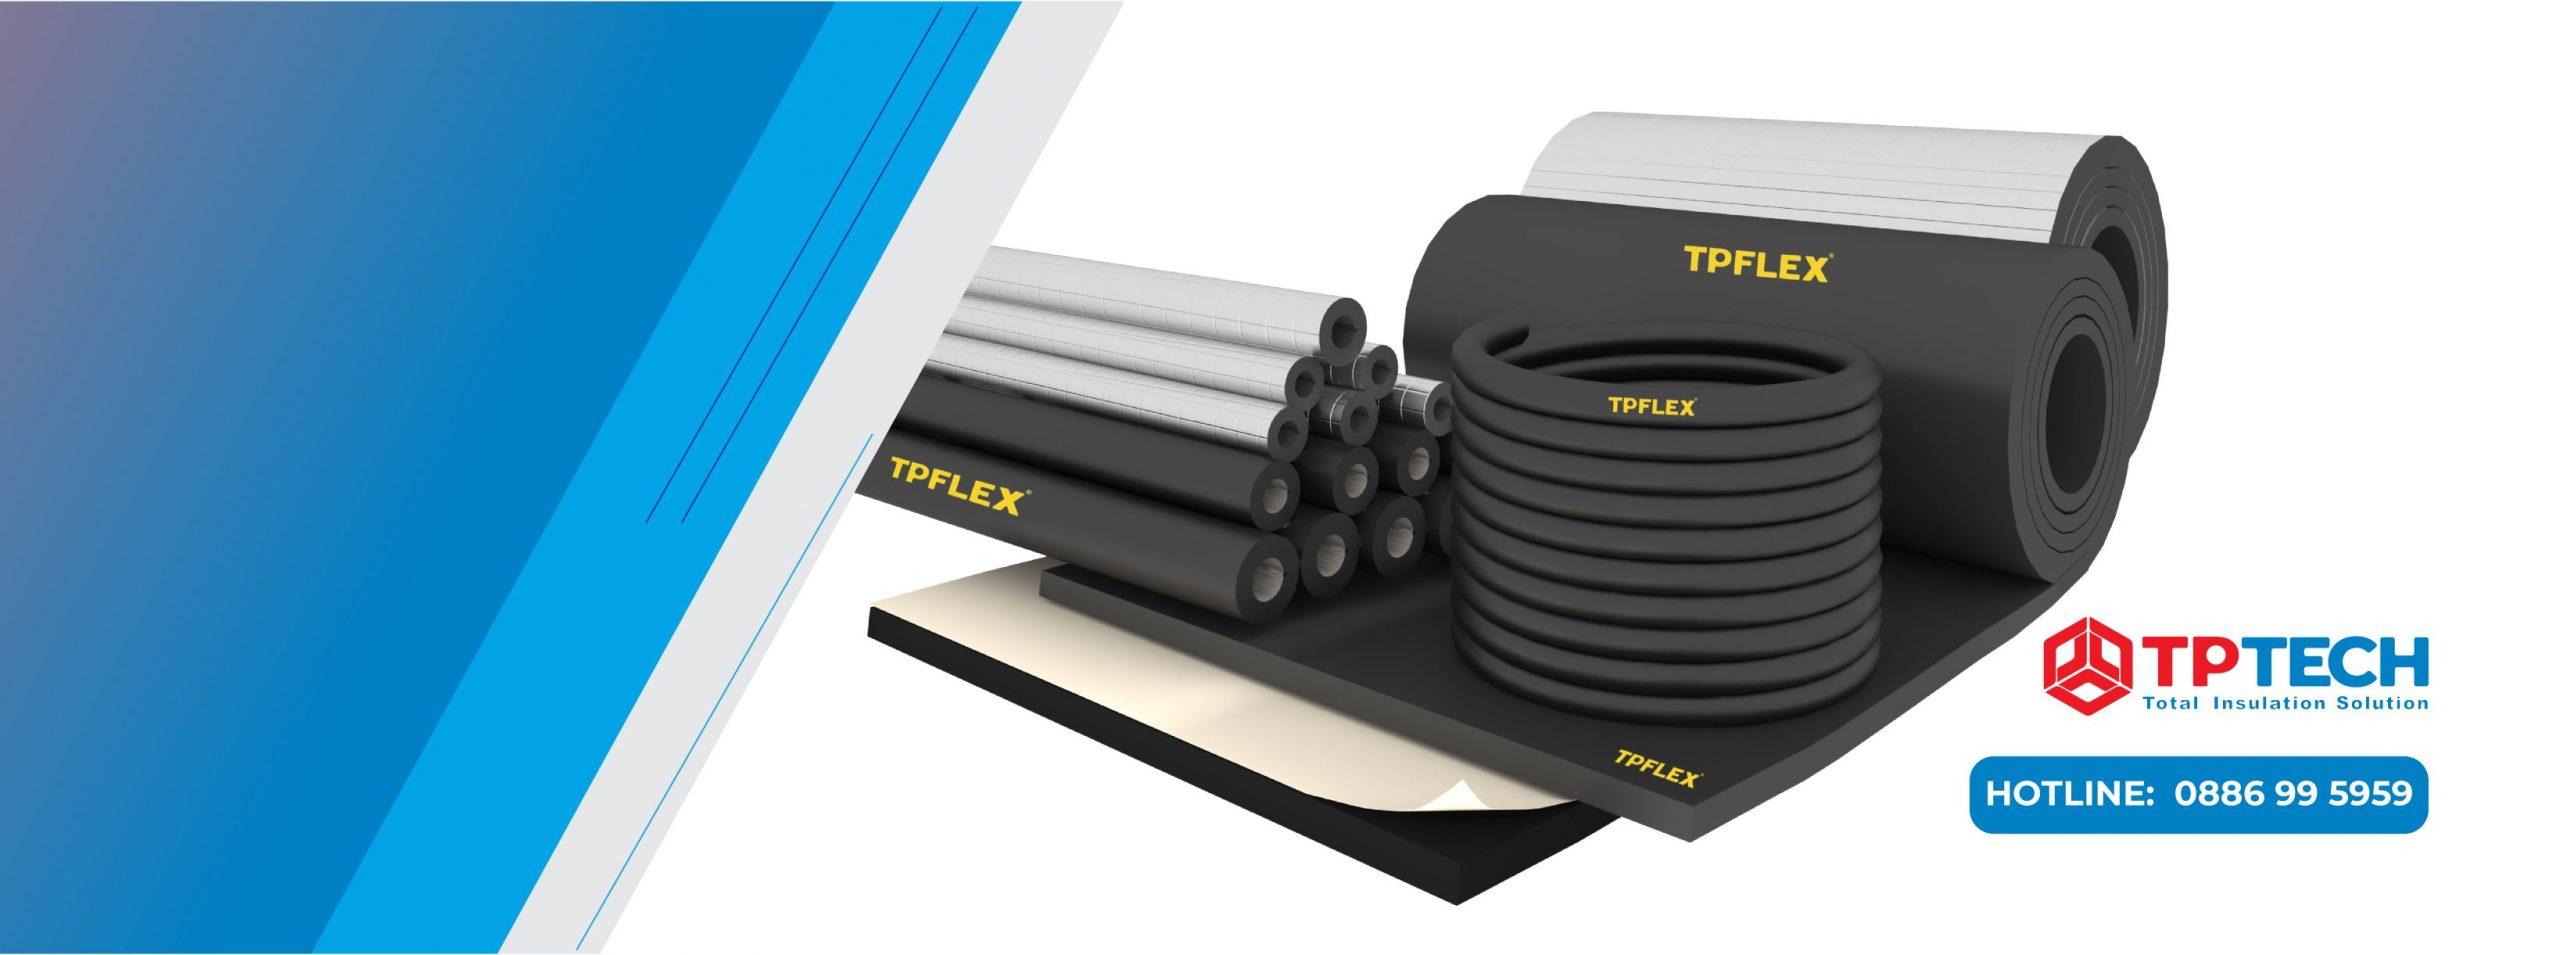 TPFLEX